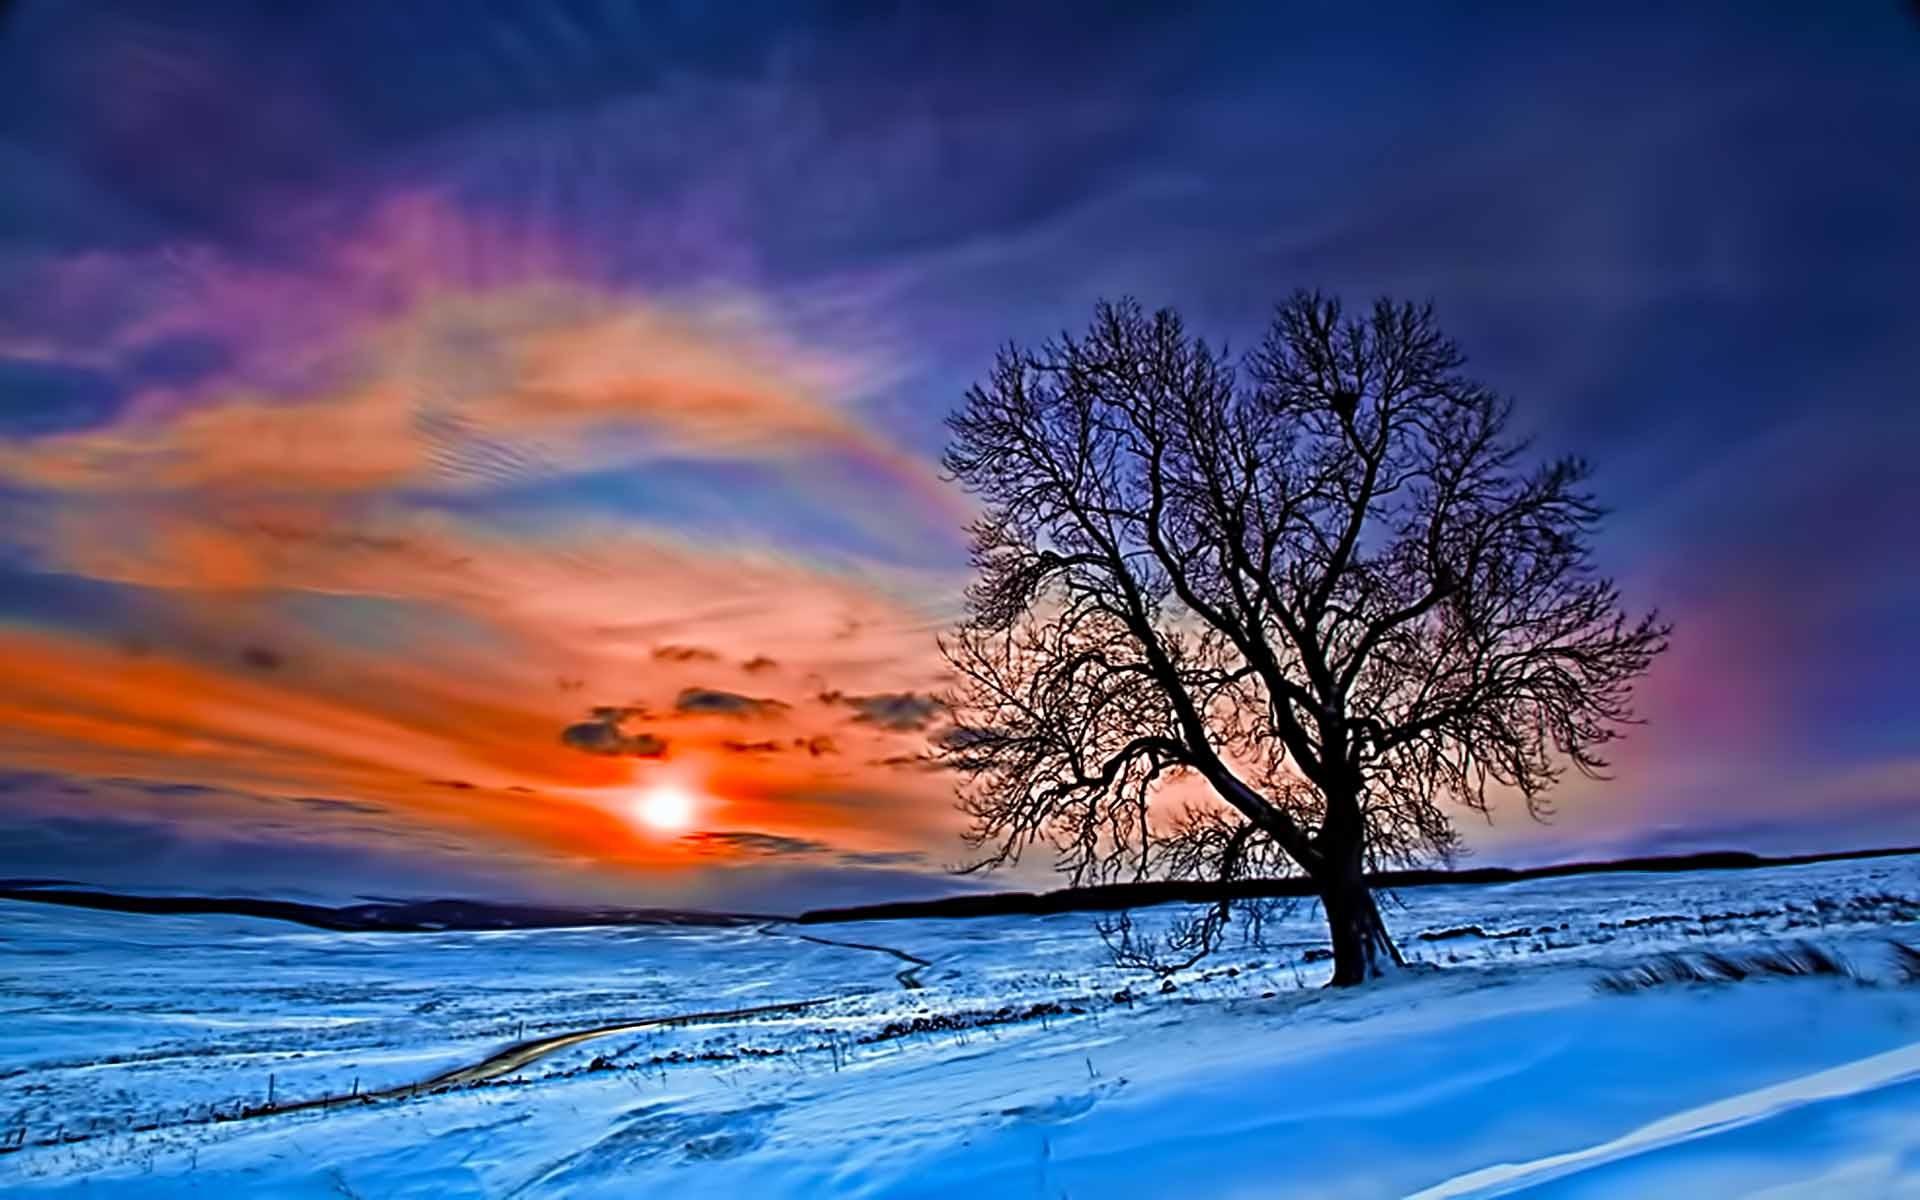 Winter Beautiful Sunrise (id: